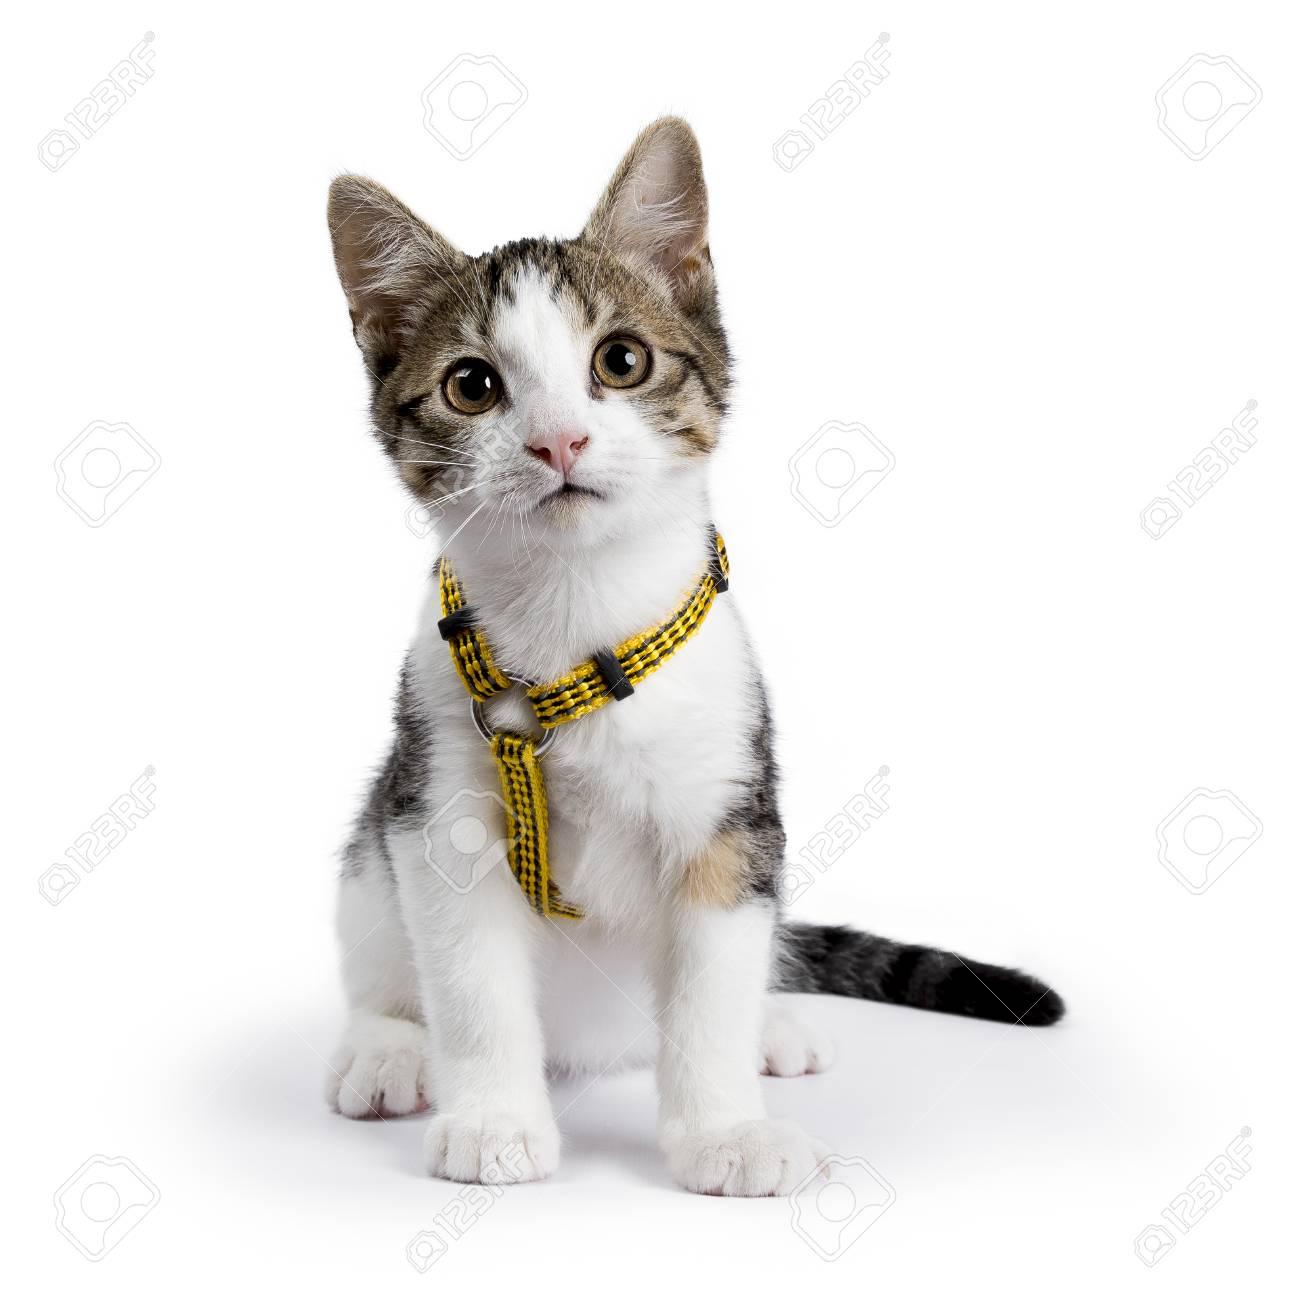 European shorthair kitten / cat sitting on white background wearing yellow harness - 83370244